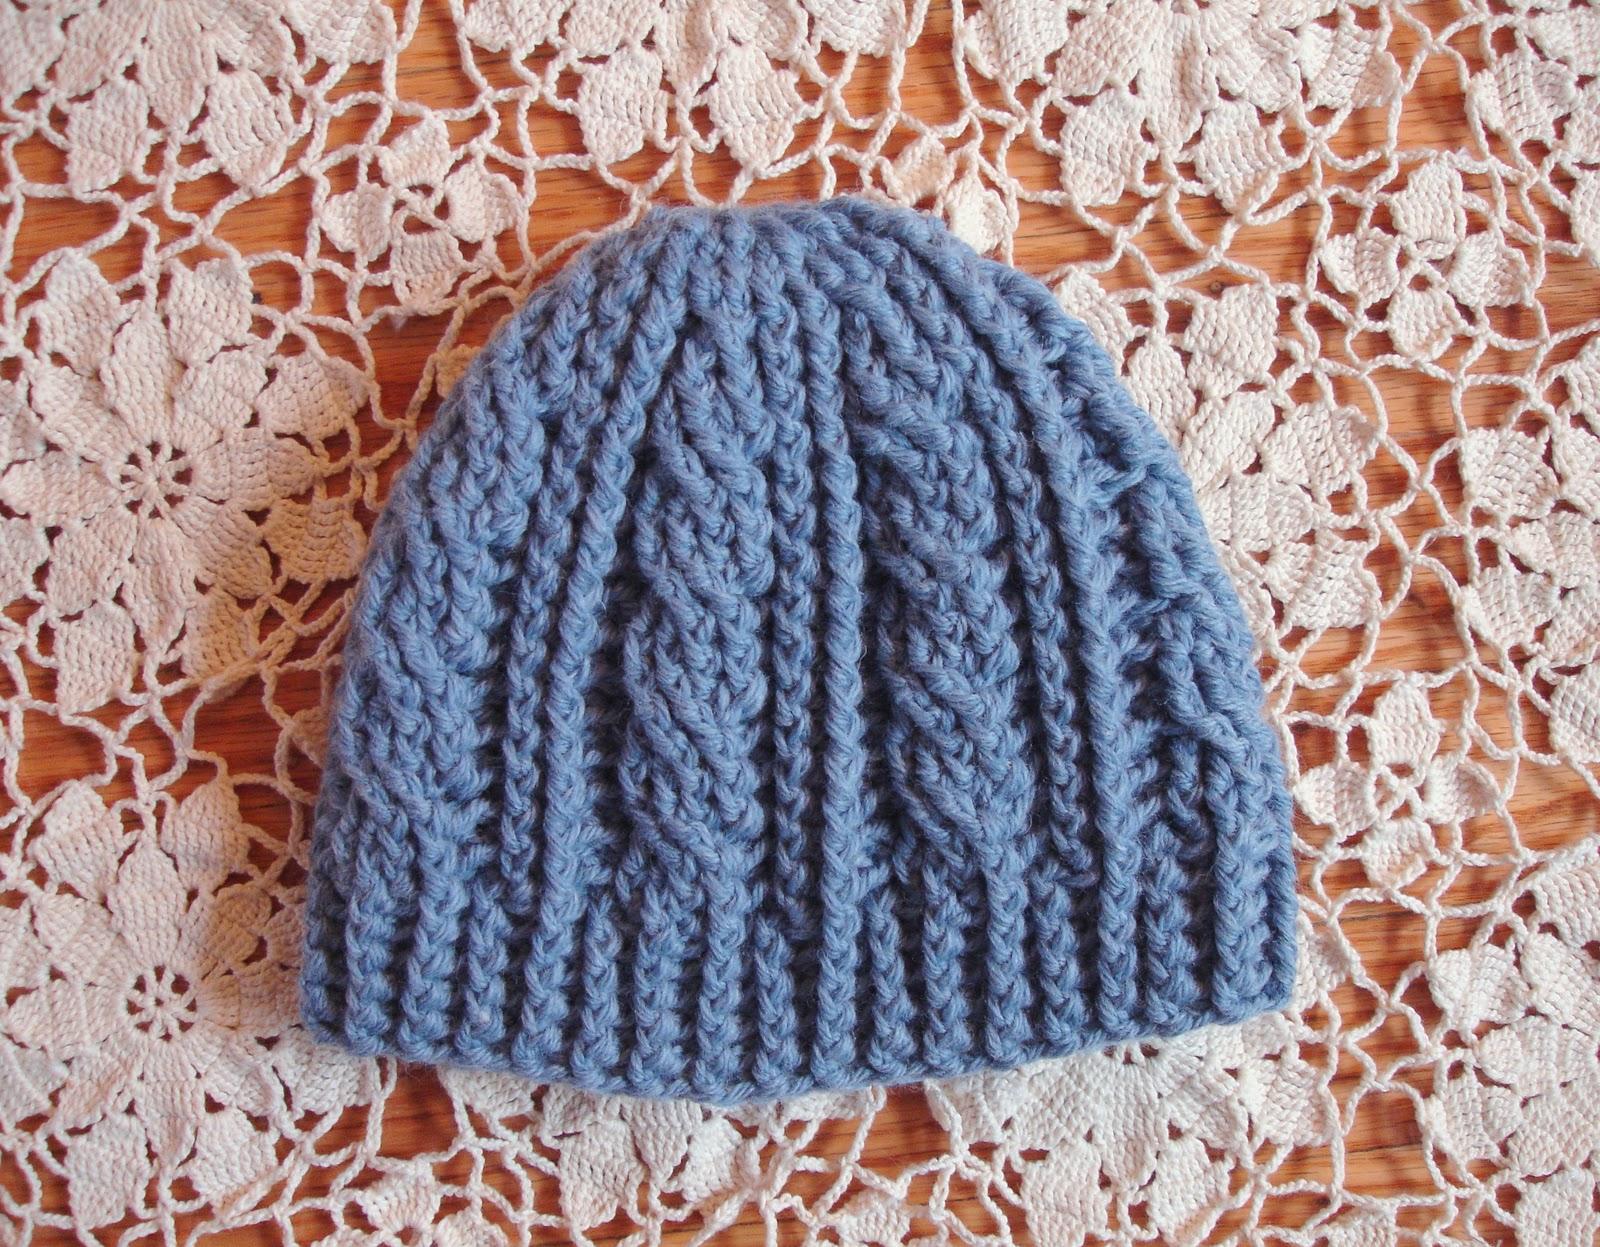 Crochet Cable Stitch Hat - Bomer